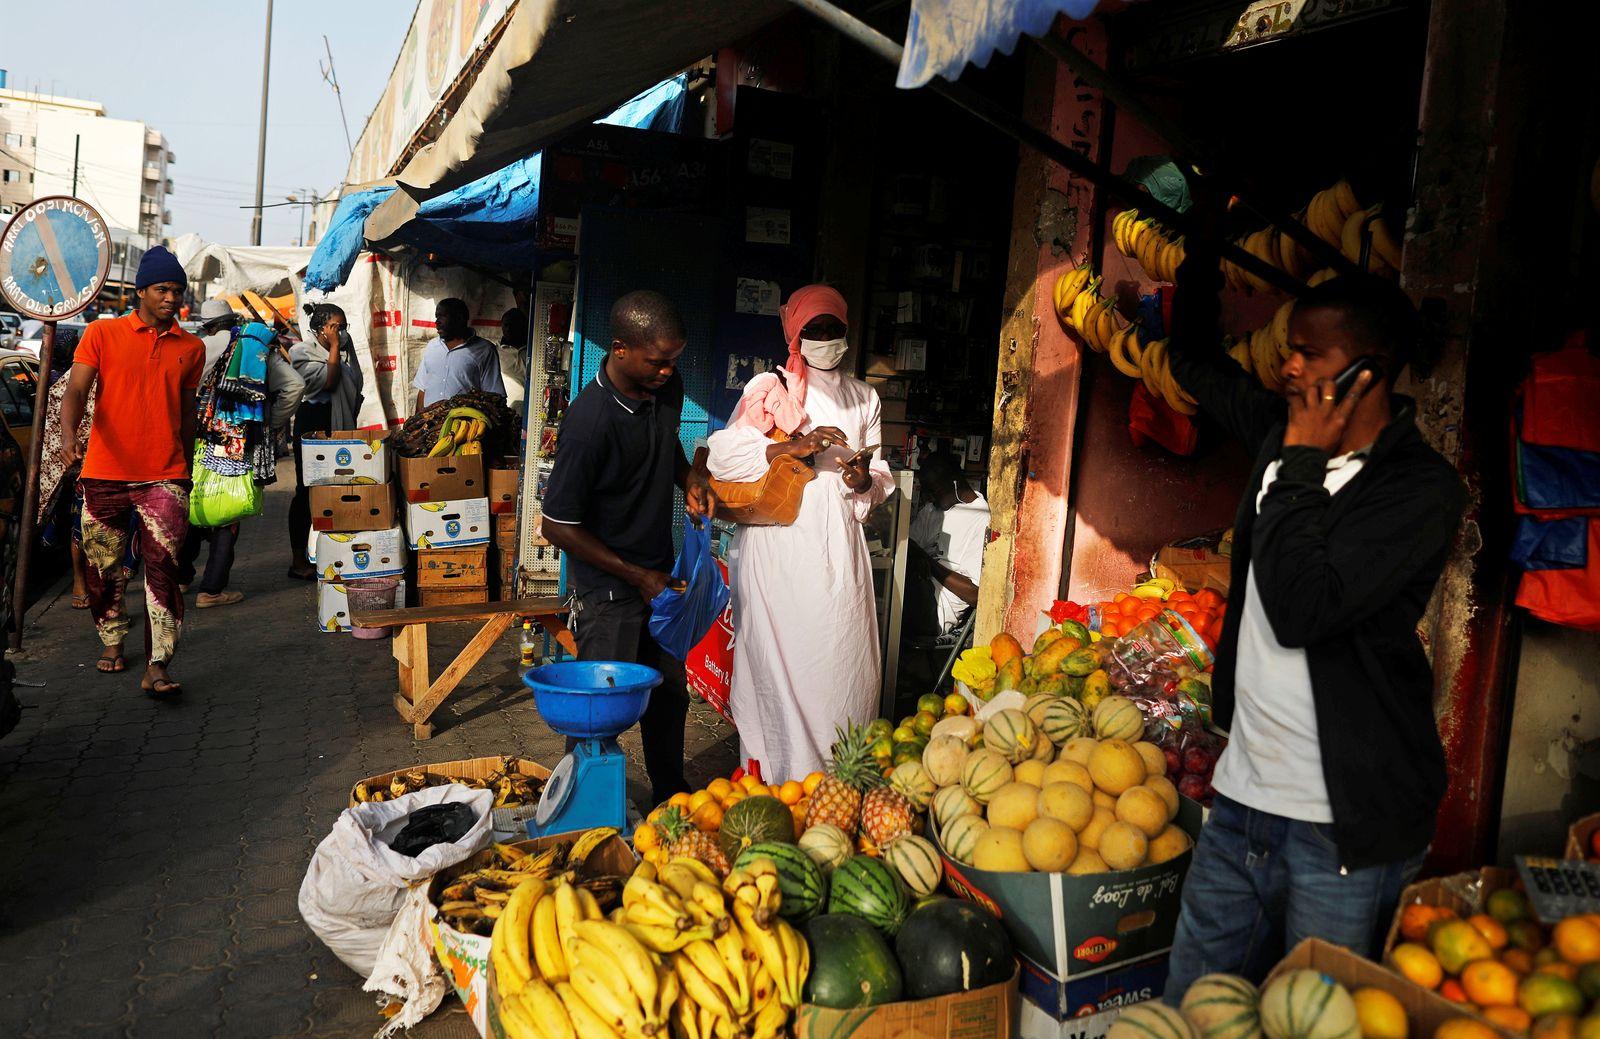 A woman wears a face mask, due to the global coronavirus disease (COVID-19) outbreak, as she shops along a busy shopping street in Dakar,